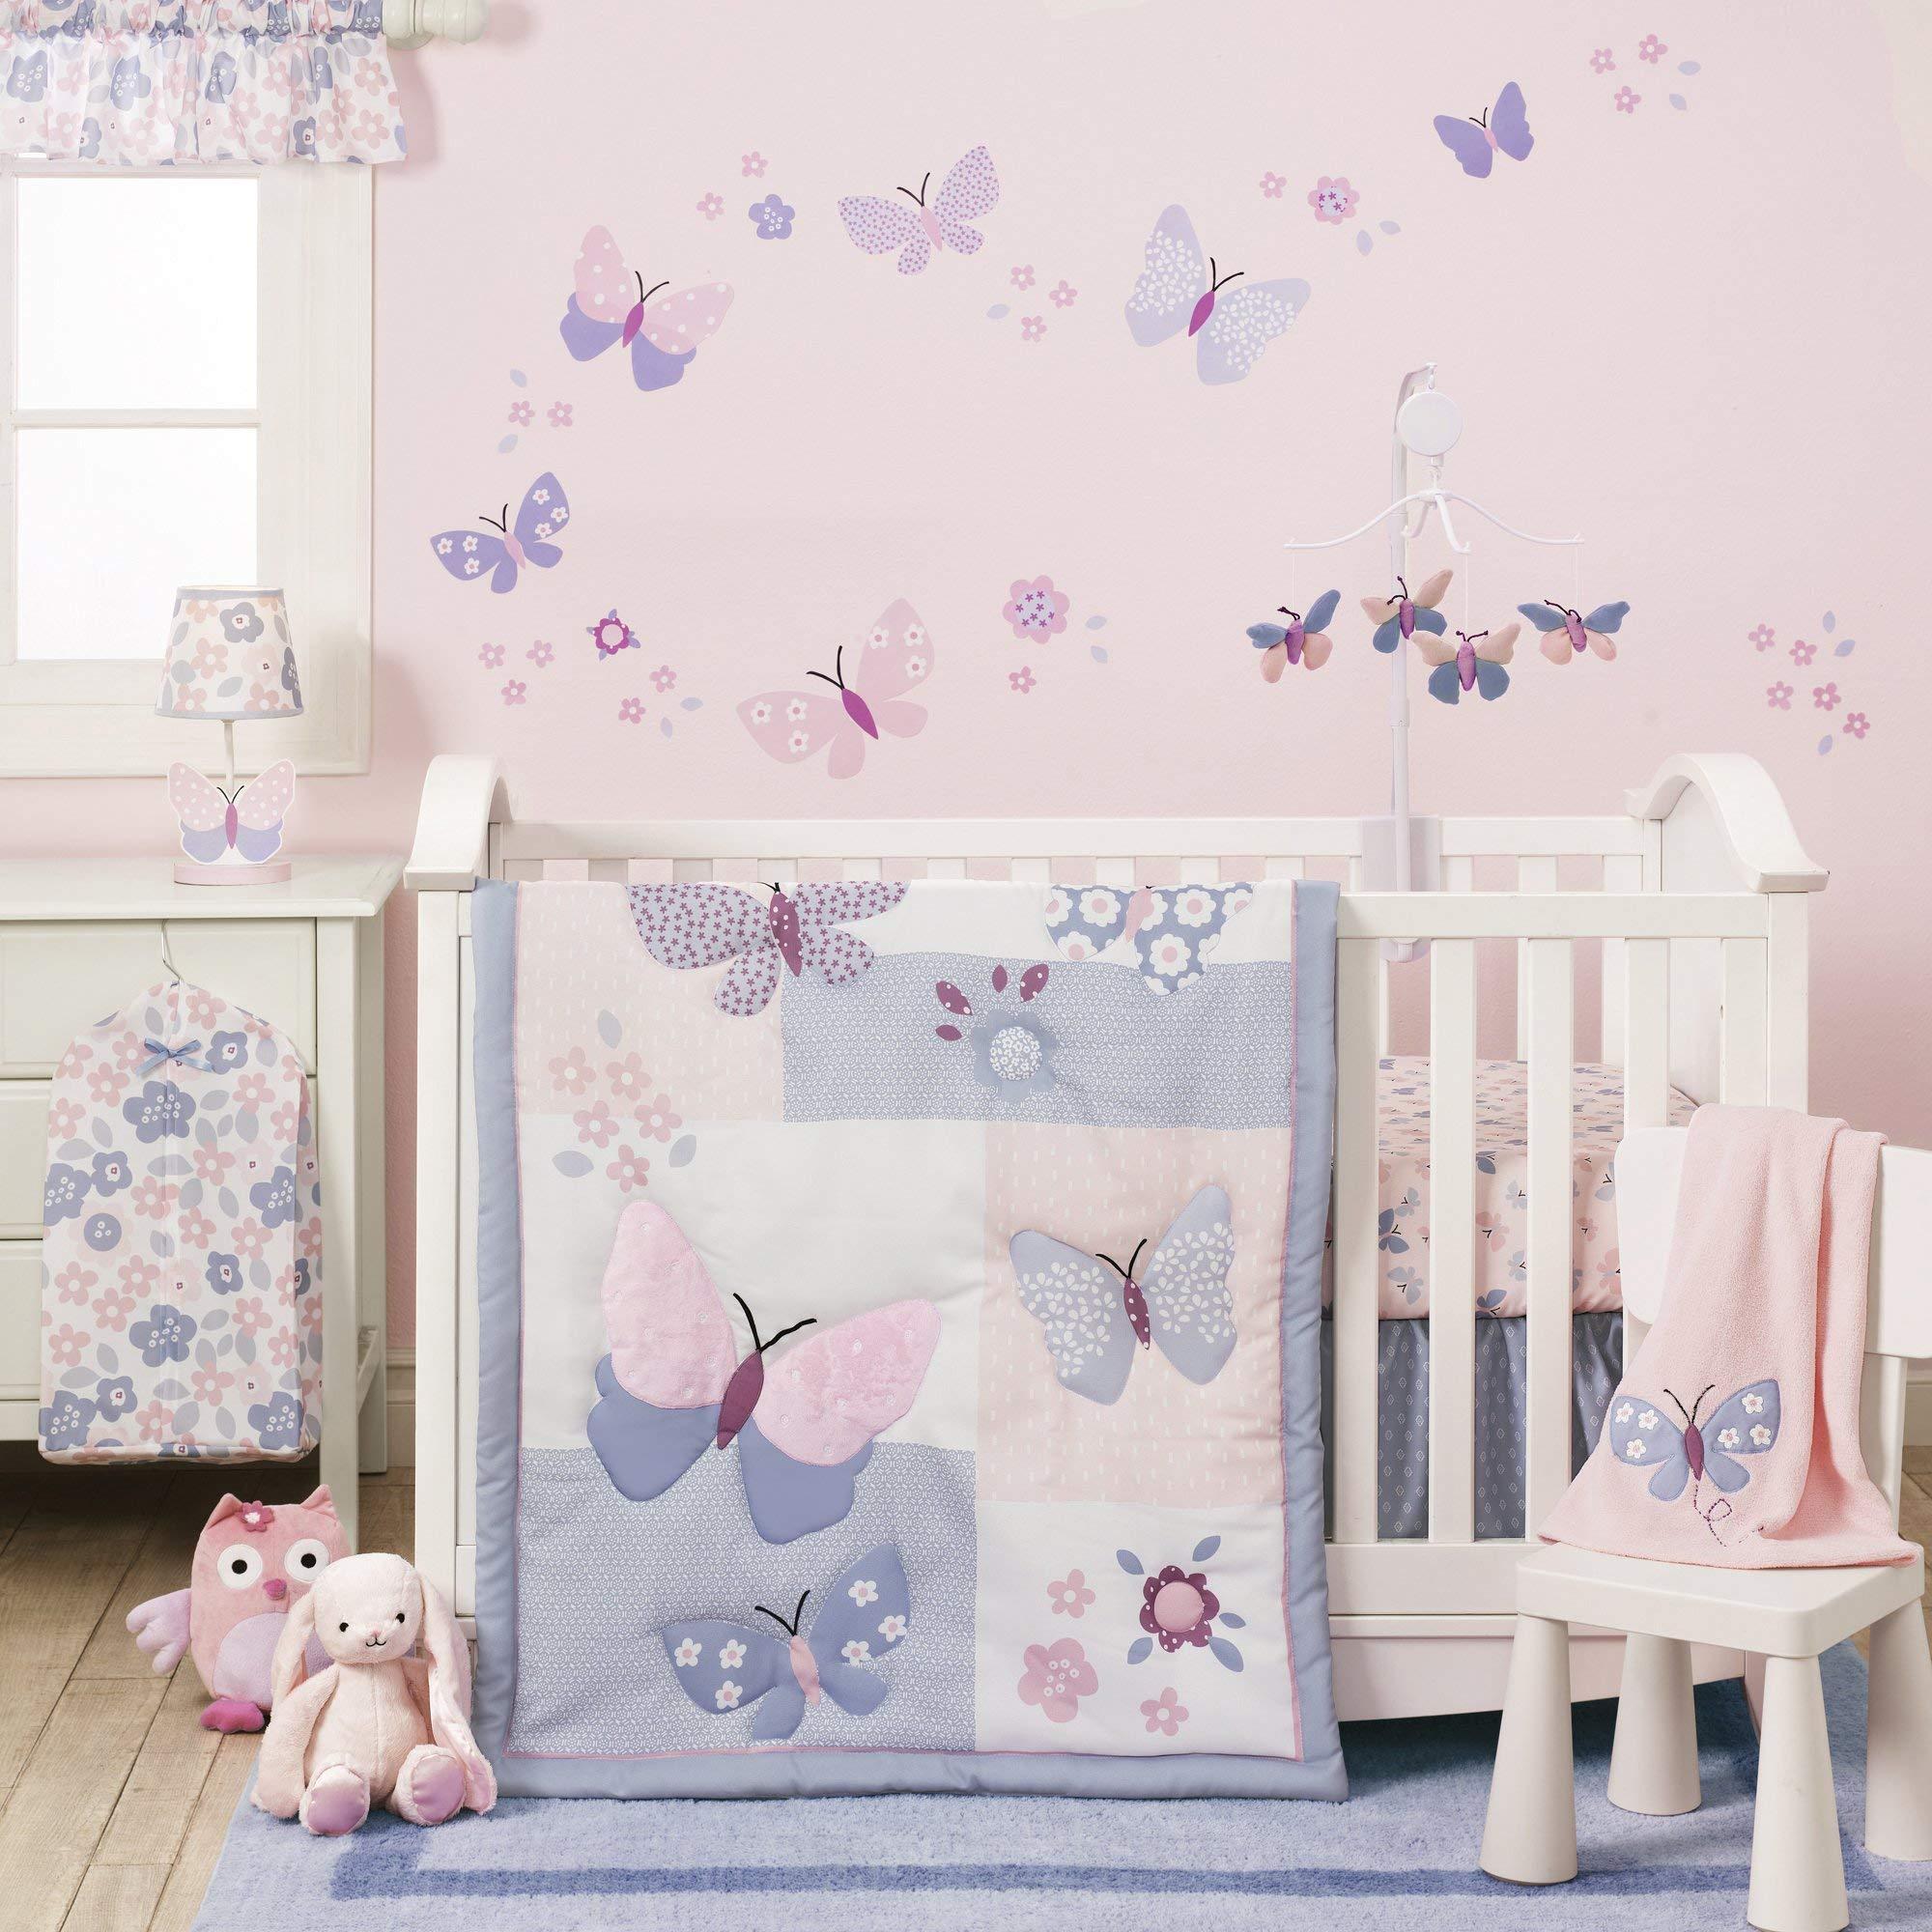 Bedtime Originals Butterfly Meadow Bedding Set, 3 Piece by Bedtime Originals